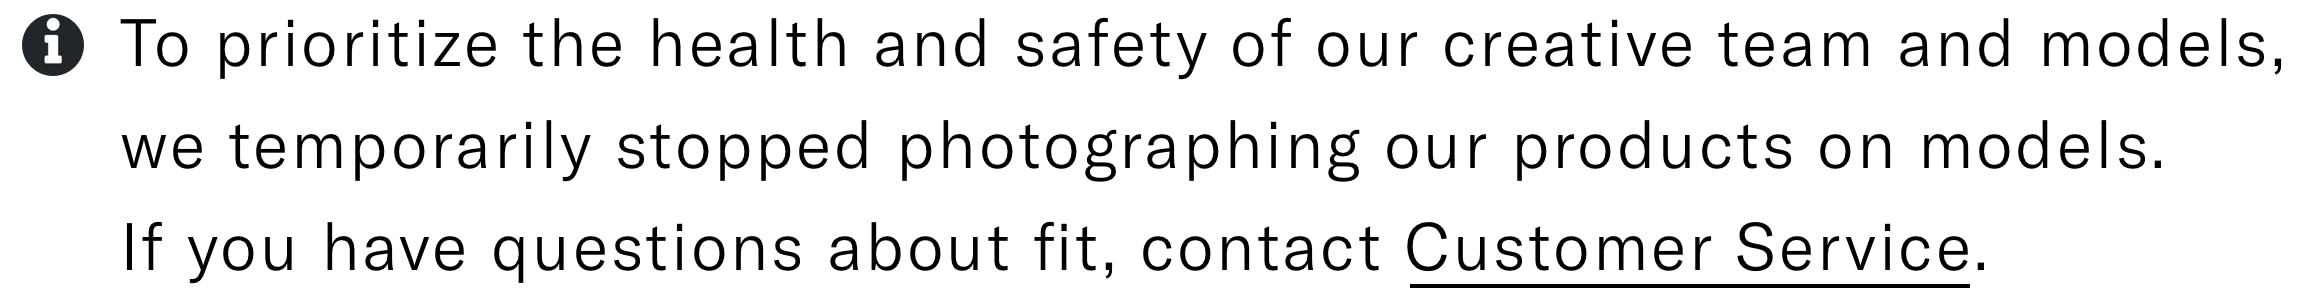 Model Alert Image